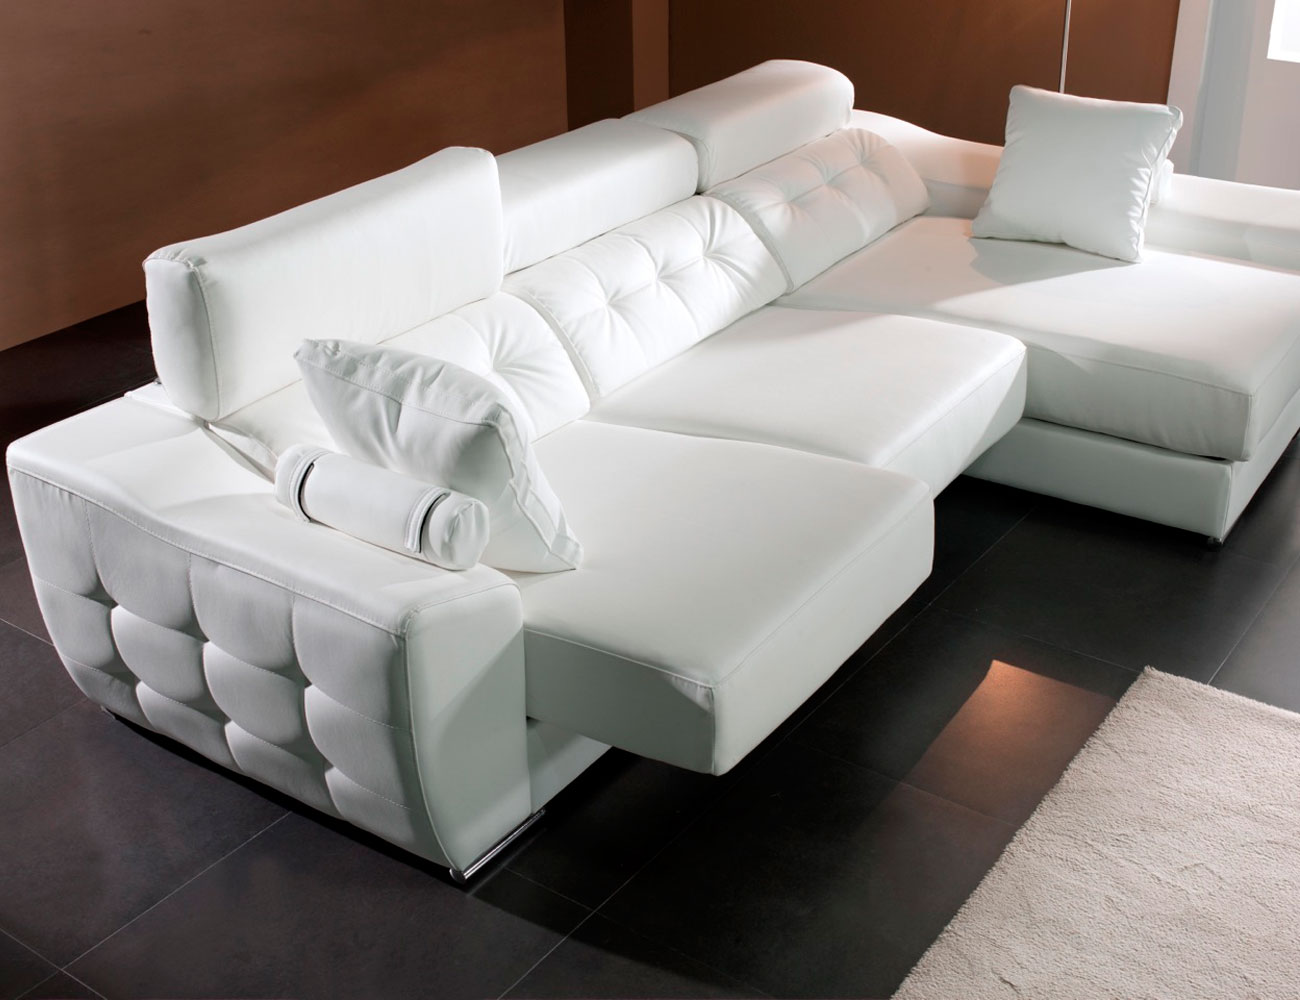 Sofa chaiselongue moderno capitone polipiel blanco6